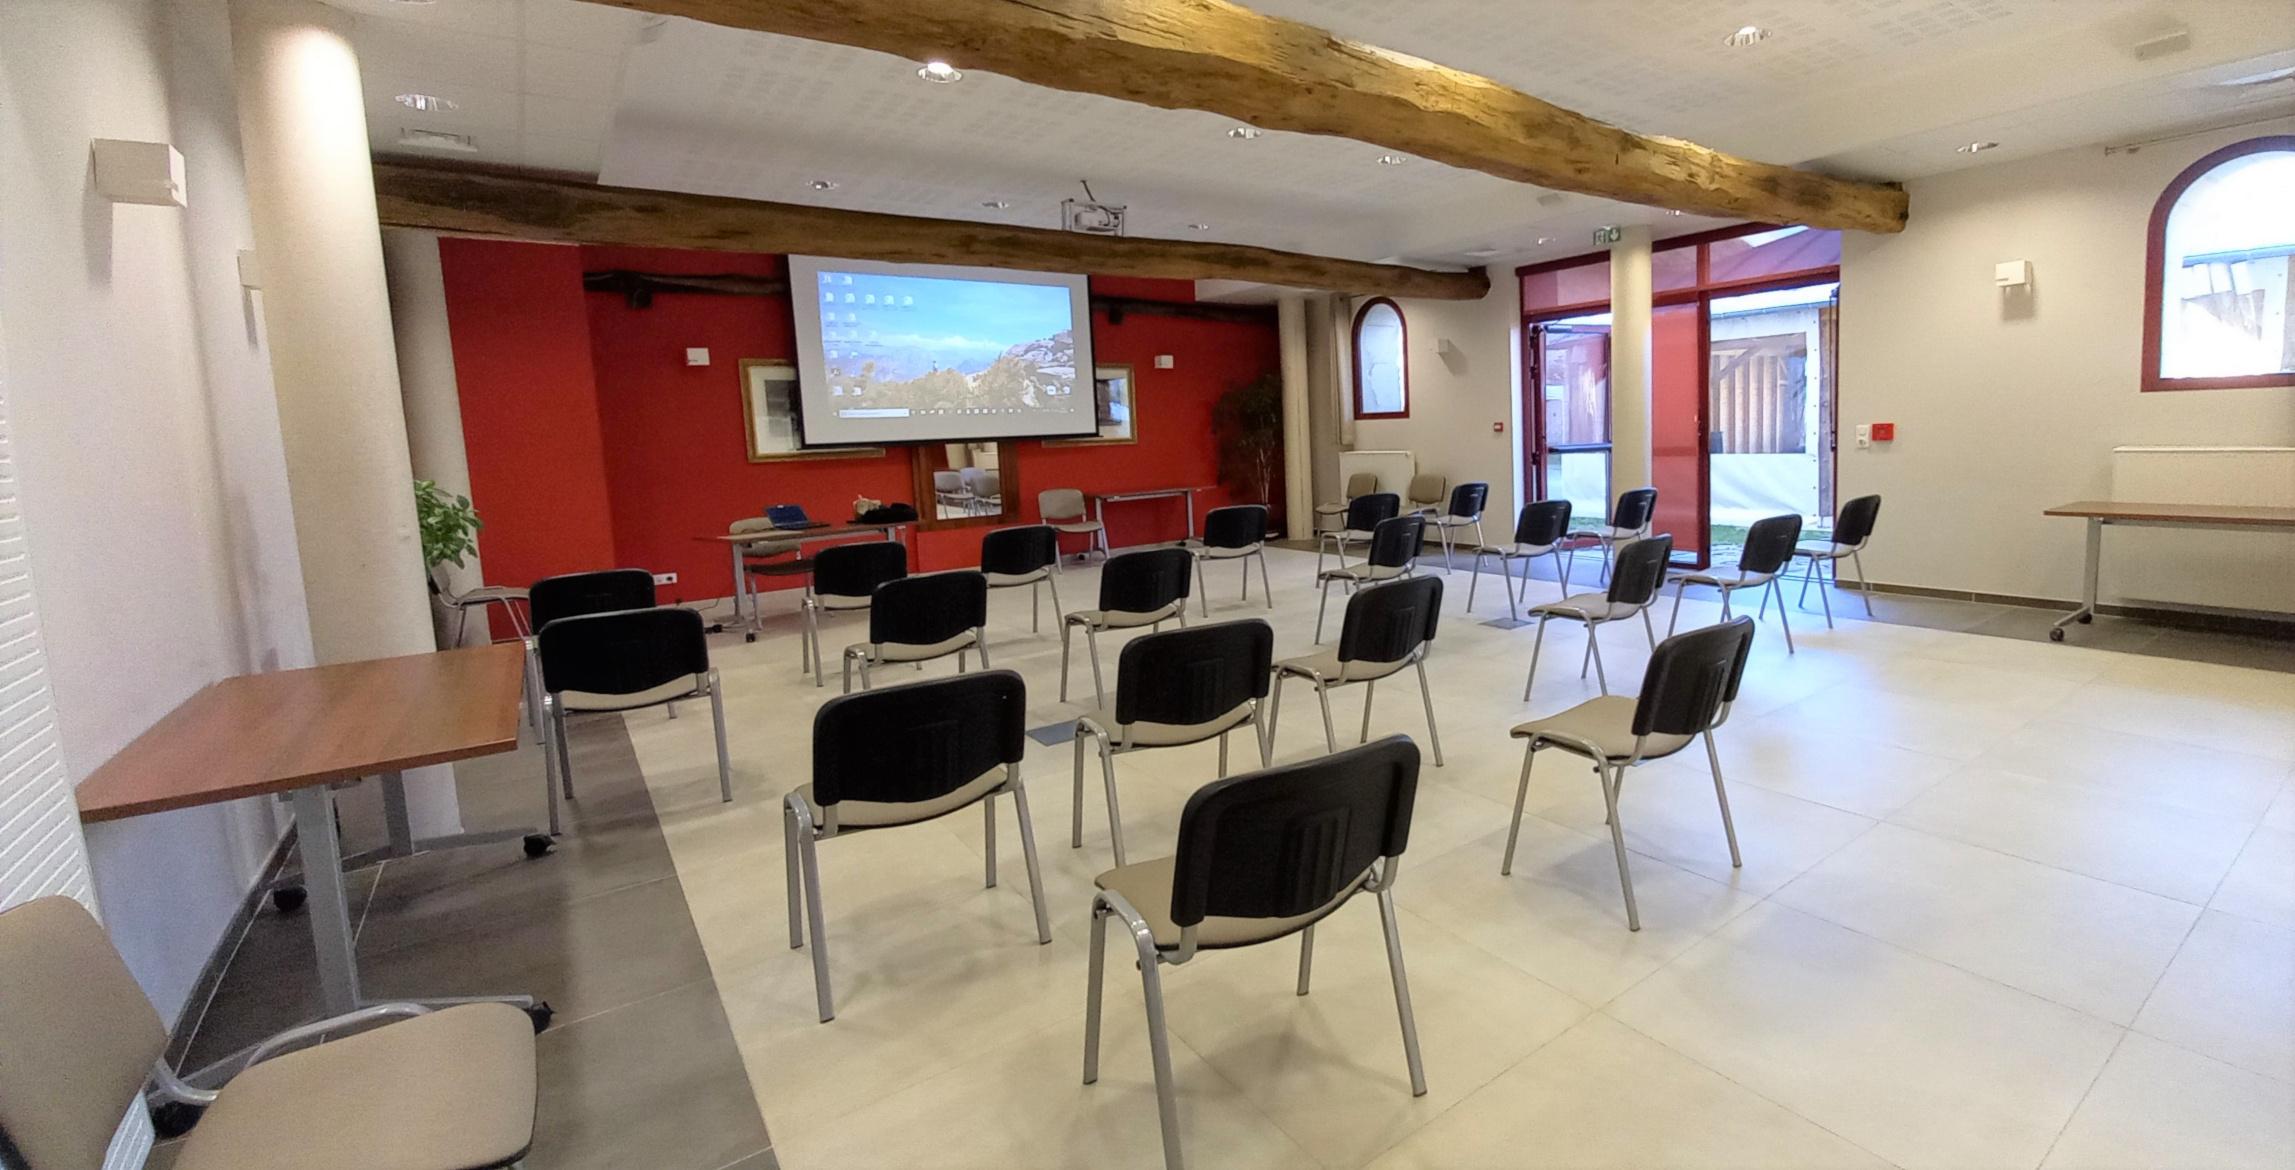 salle-reunion-formation-exterieurs-PMR-oise-lacroiseedespossibles